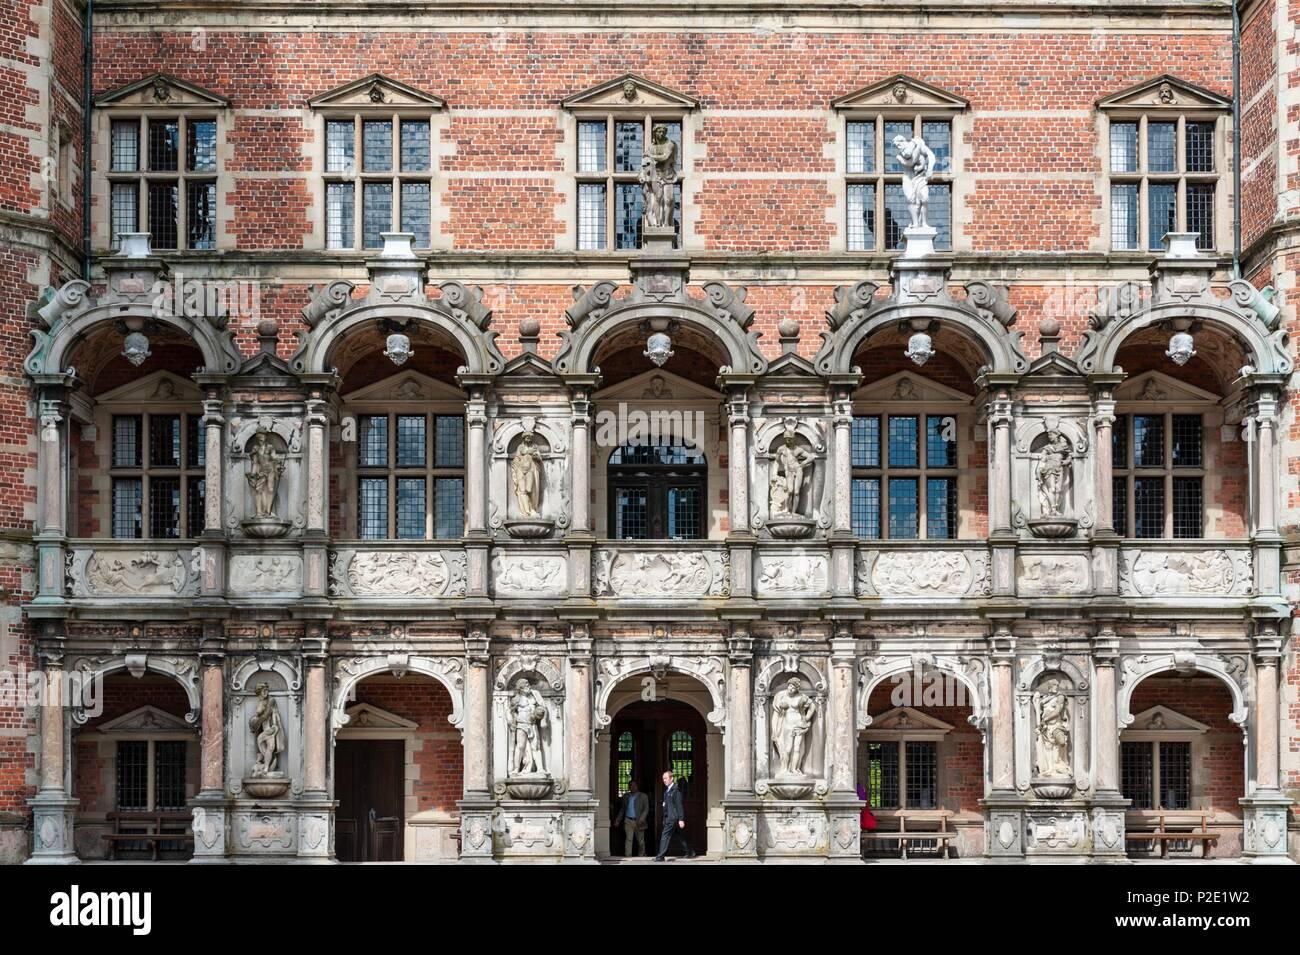 Denmark, Zealand, Hillerod, Frederiksborg Royal Castle - Stock Image